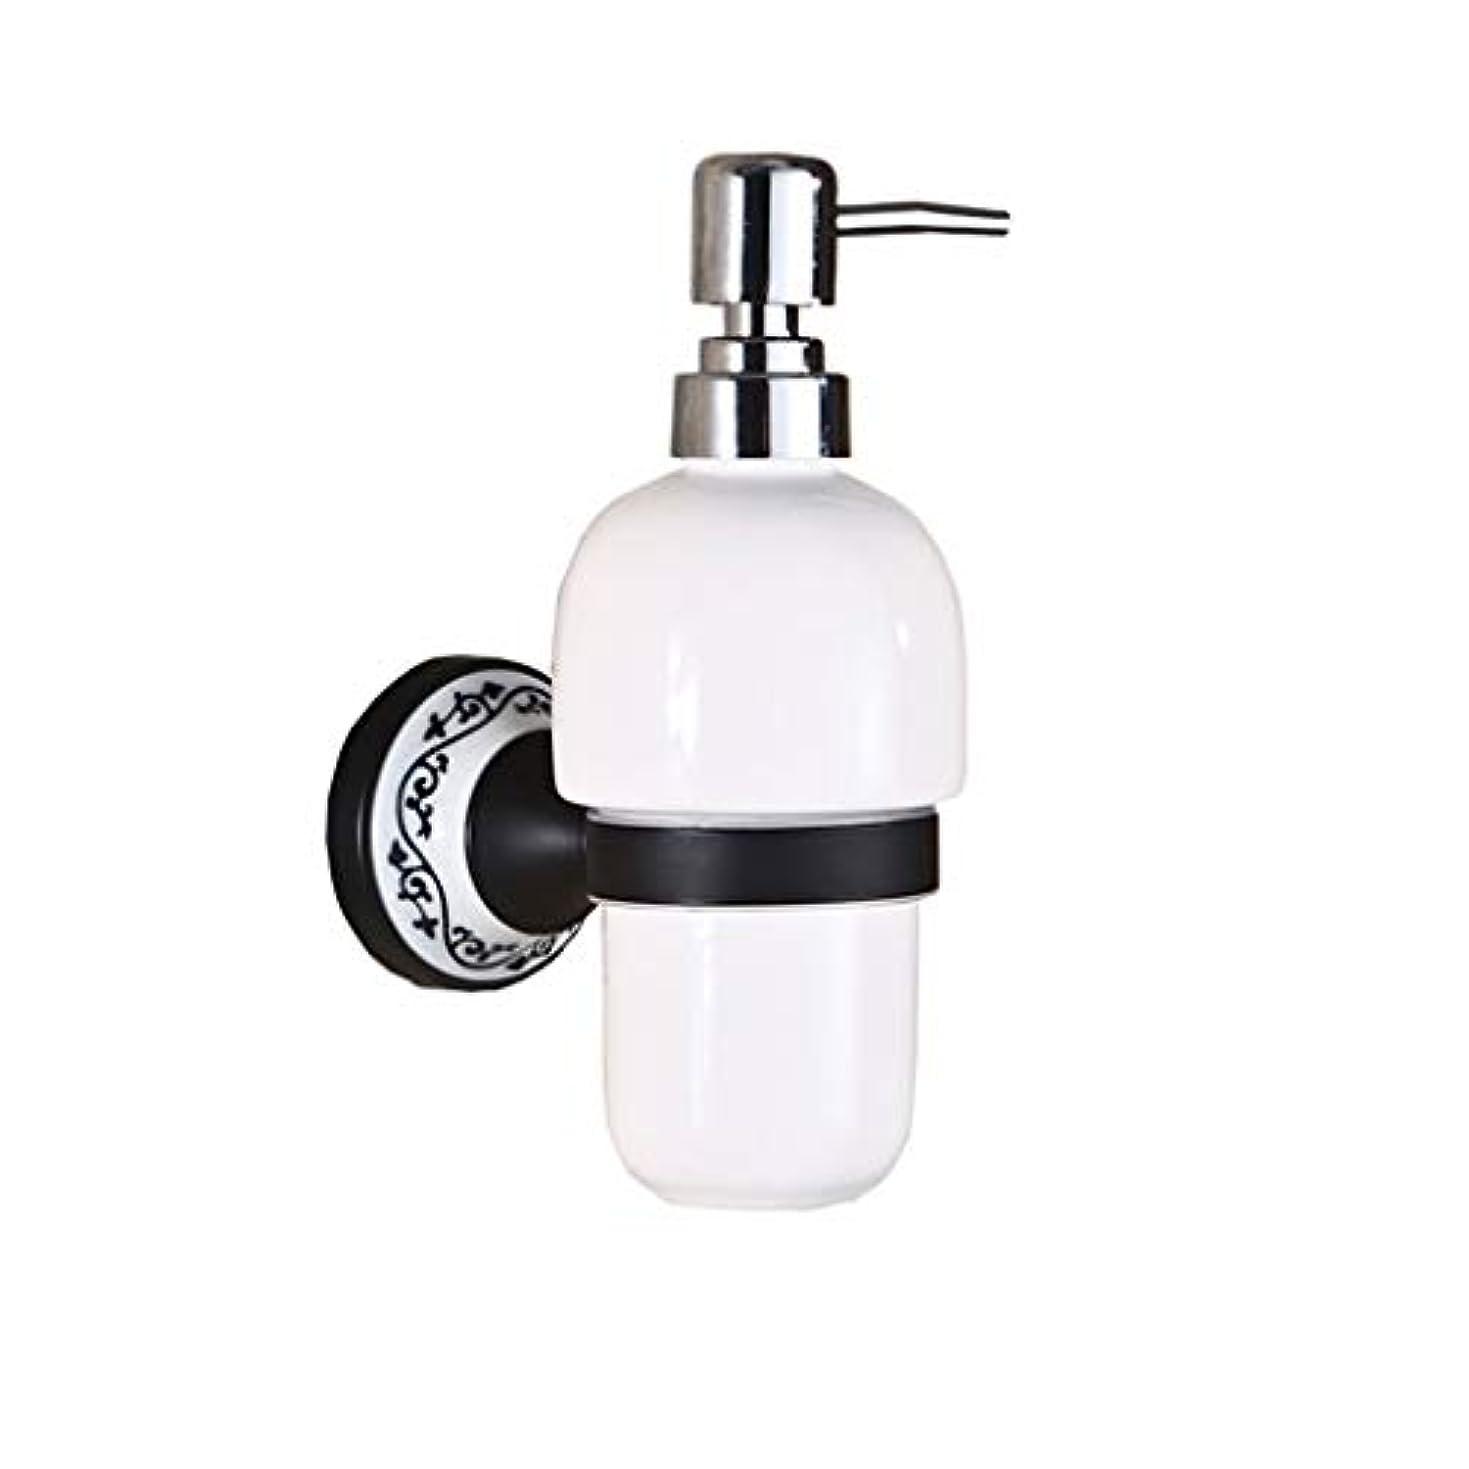 Kylinssh 石鹸ディスペンサー、304防錆ステンレス鋼ポンプ付きキッチンソープディスペンサー、ハンドソープ用のバスルームソープディスペンサー、石鹸、ローション